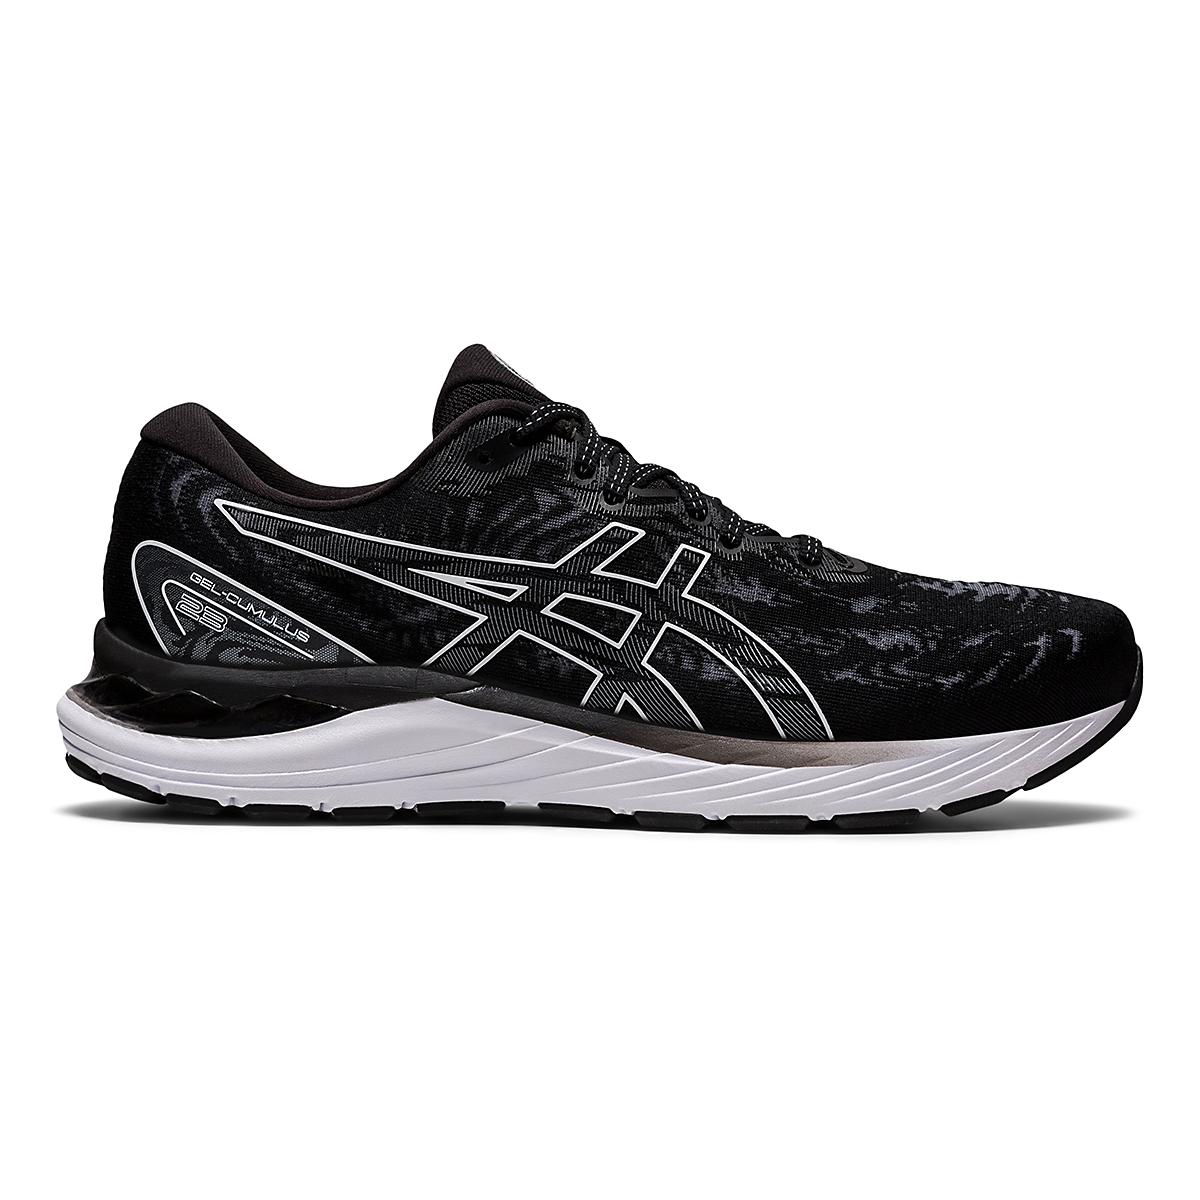 Men's Asics Gel-Cumulus 23 Running Shoe - Color: Black/White - Size: 7 - Width: Regular, Black/White, large, image 1